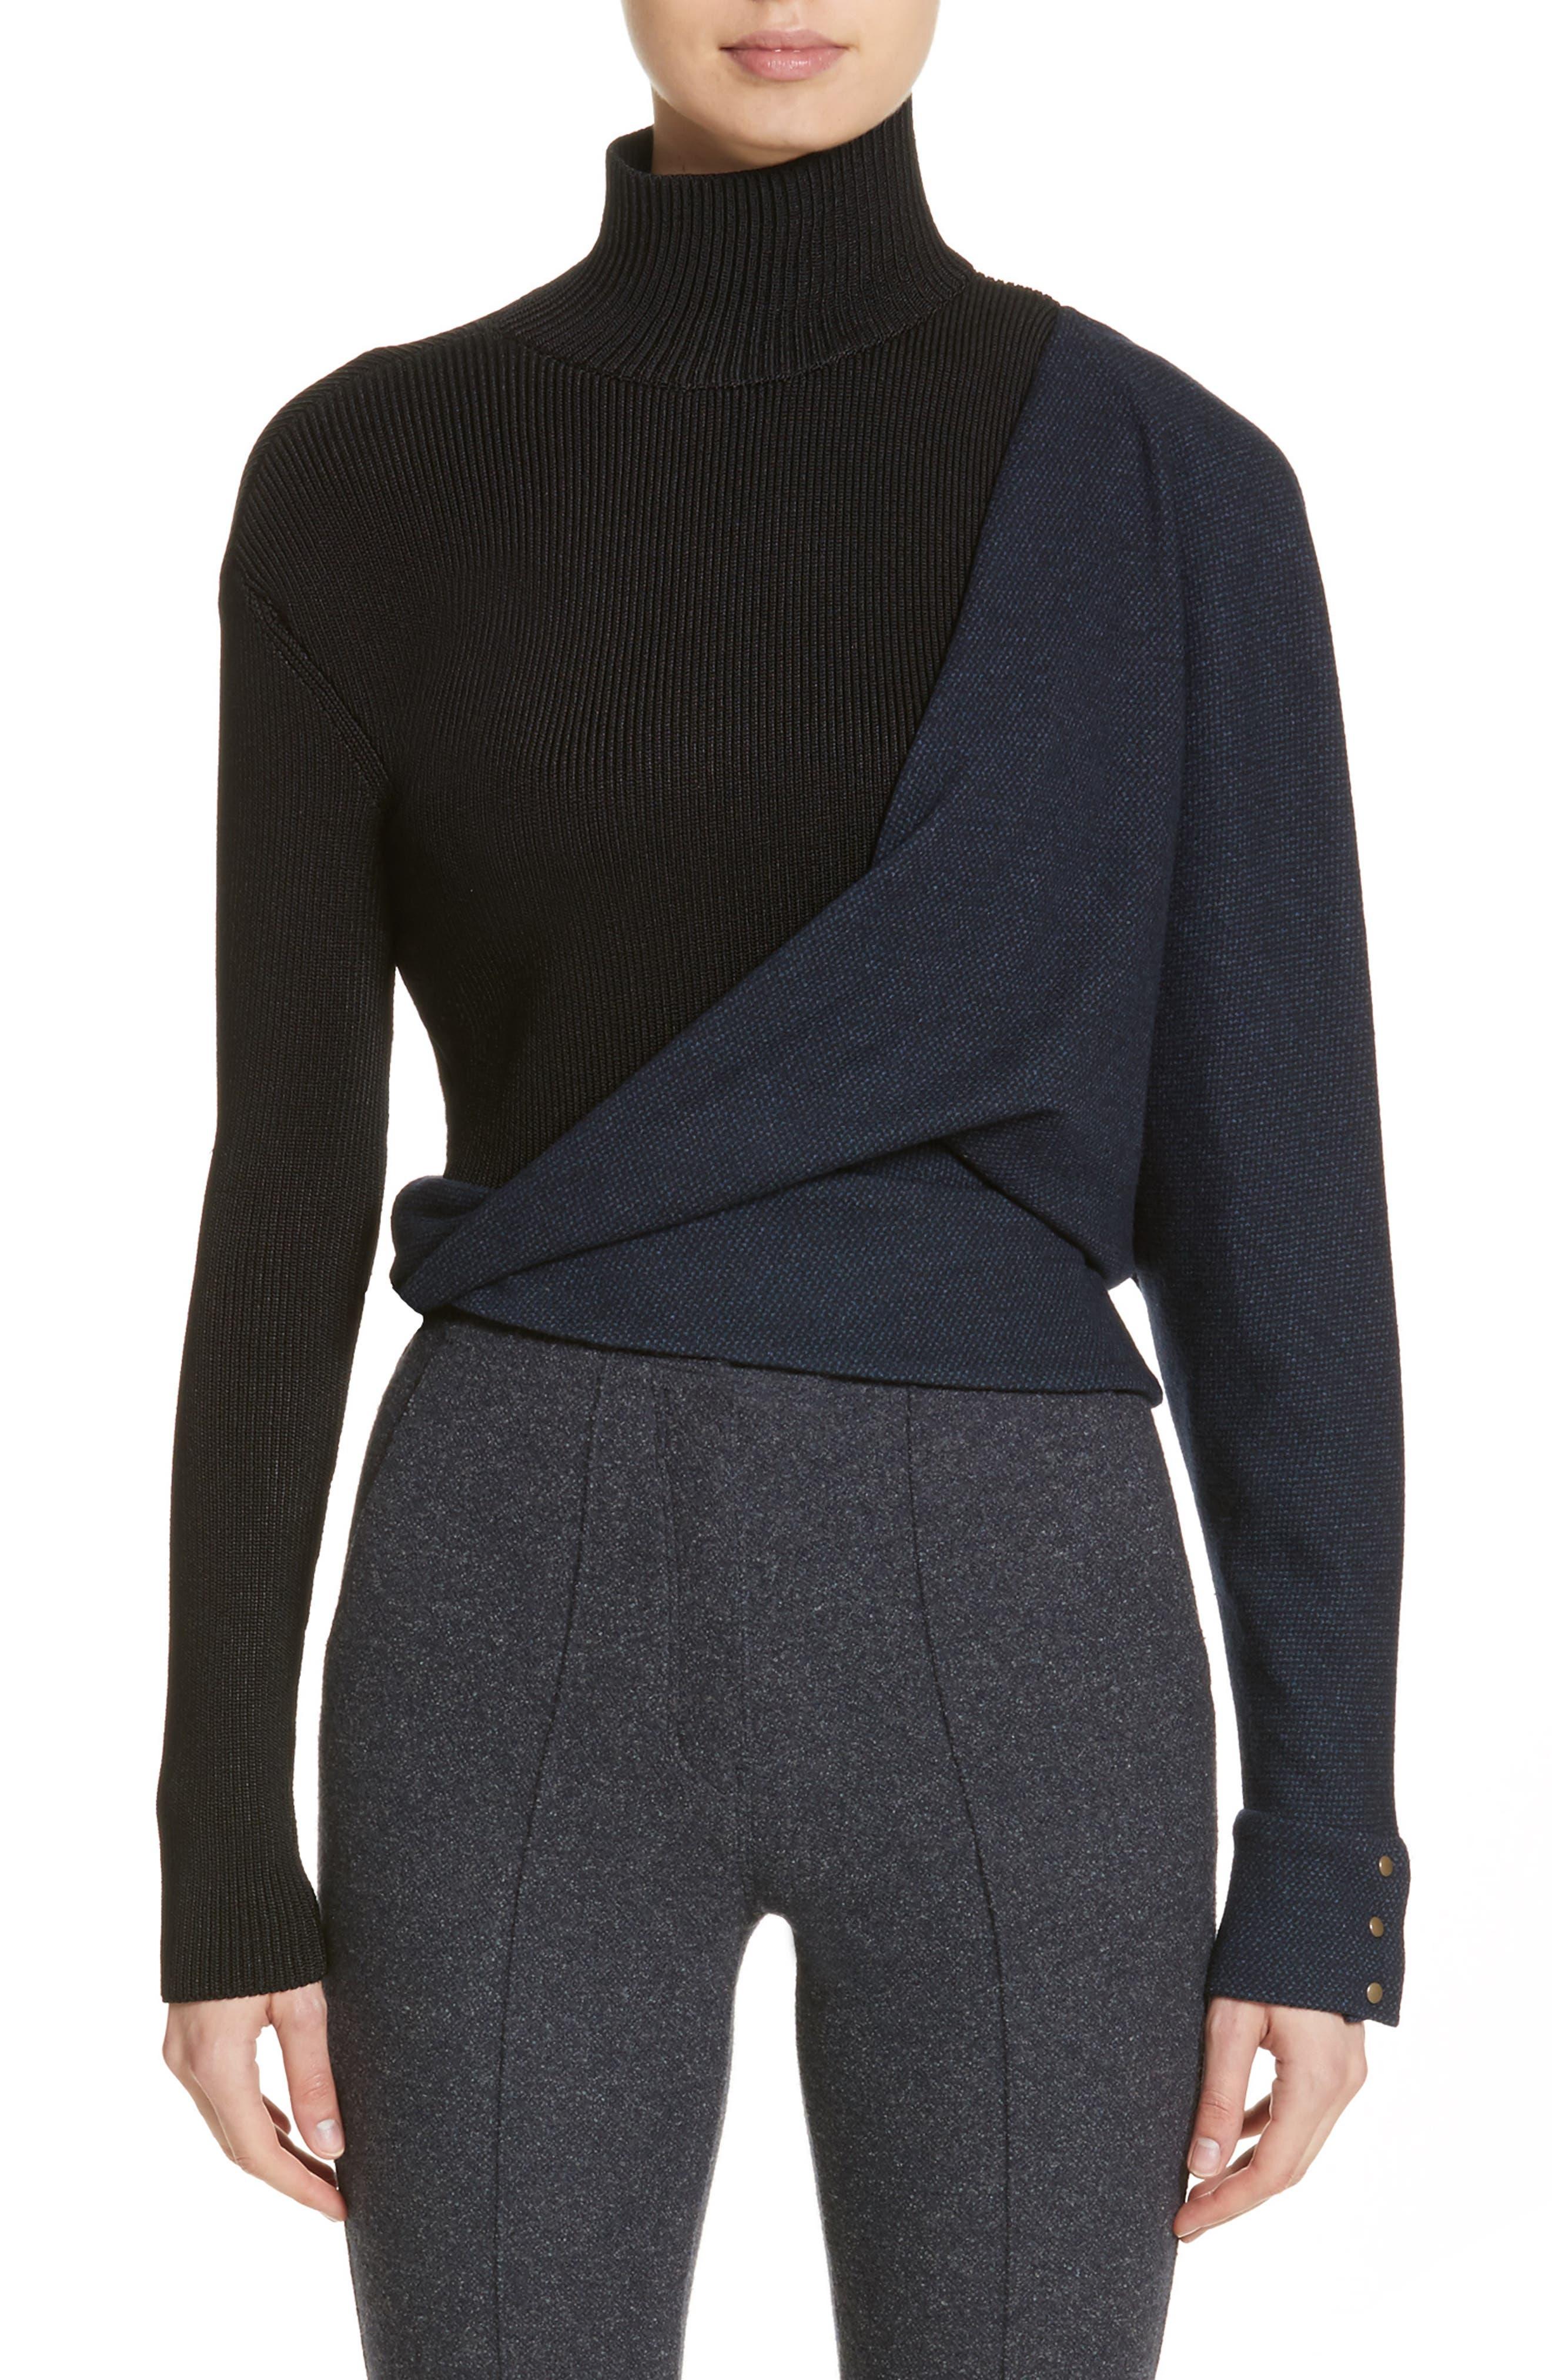 Atlein Tweed Jersey & Knit Turtleneck Sweater